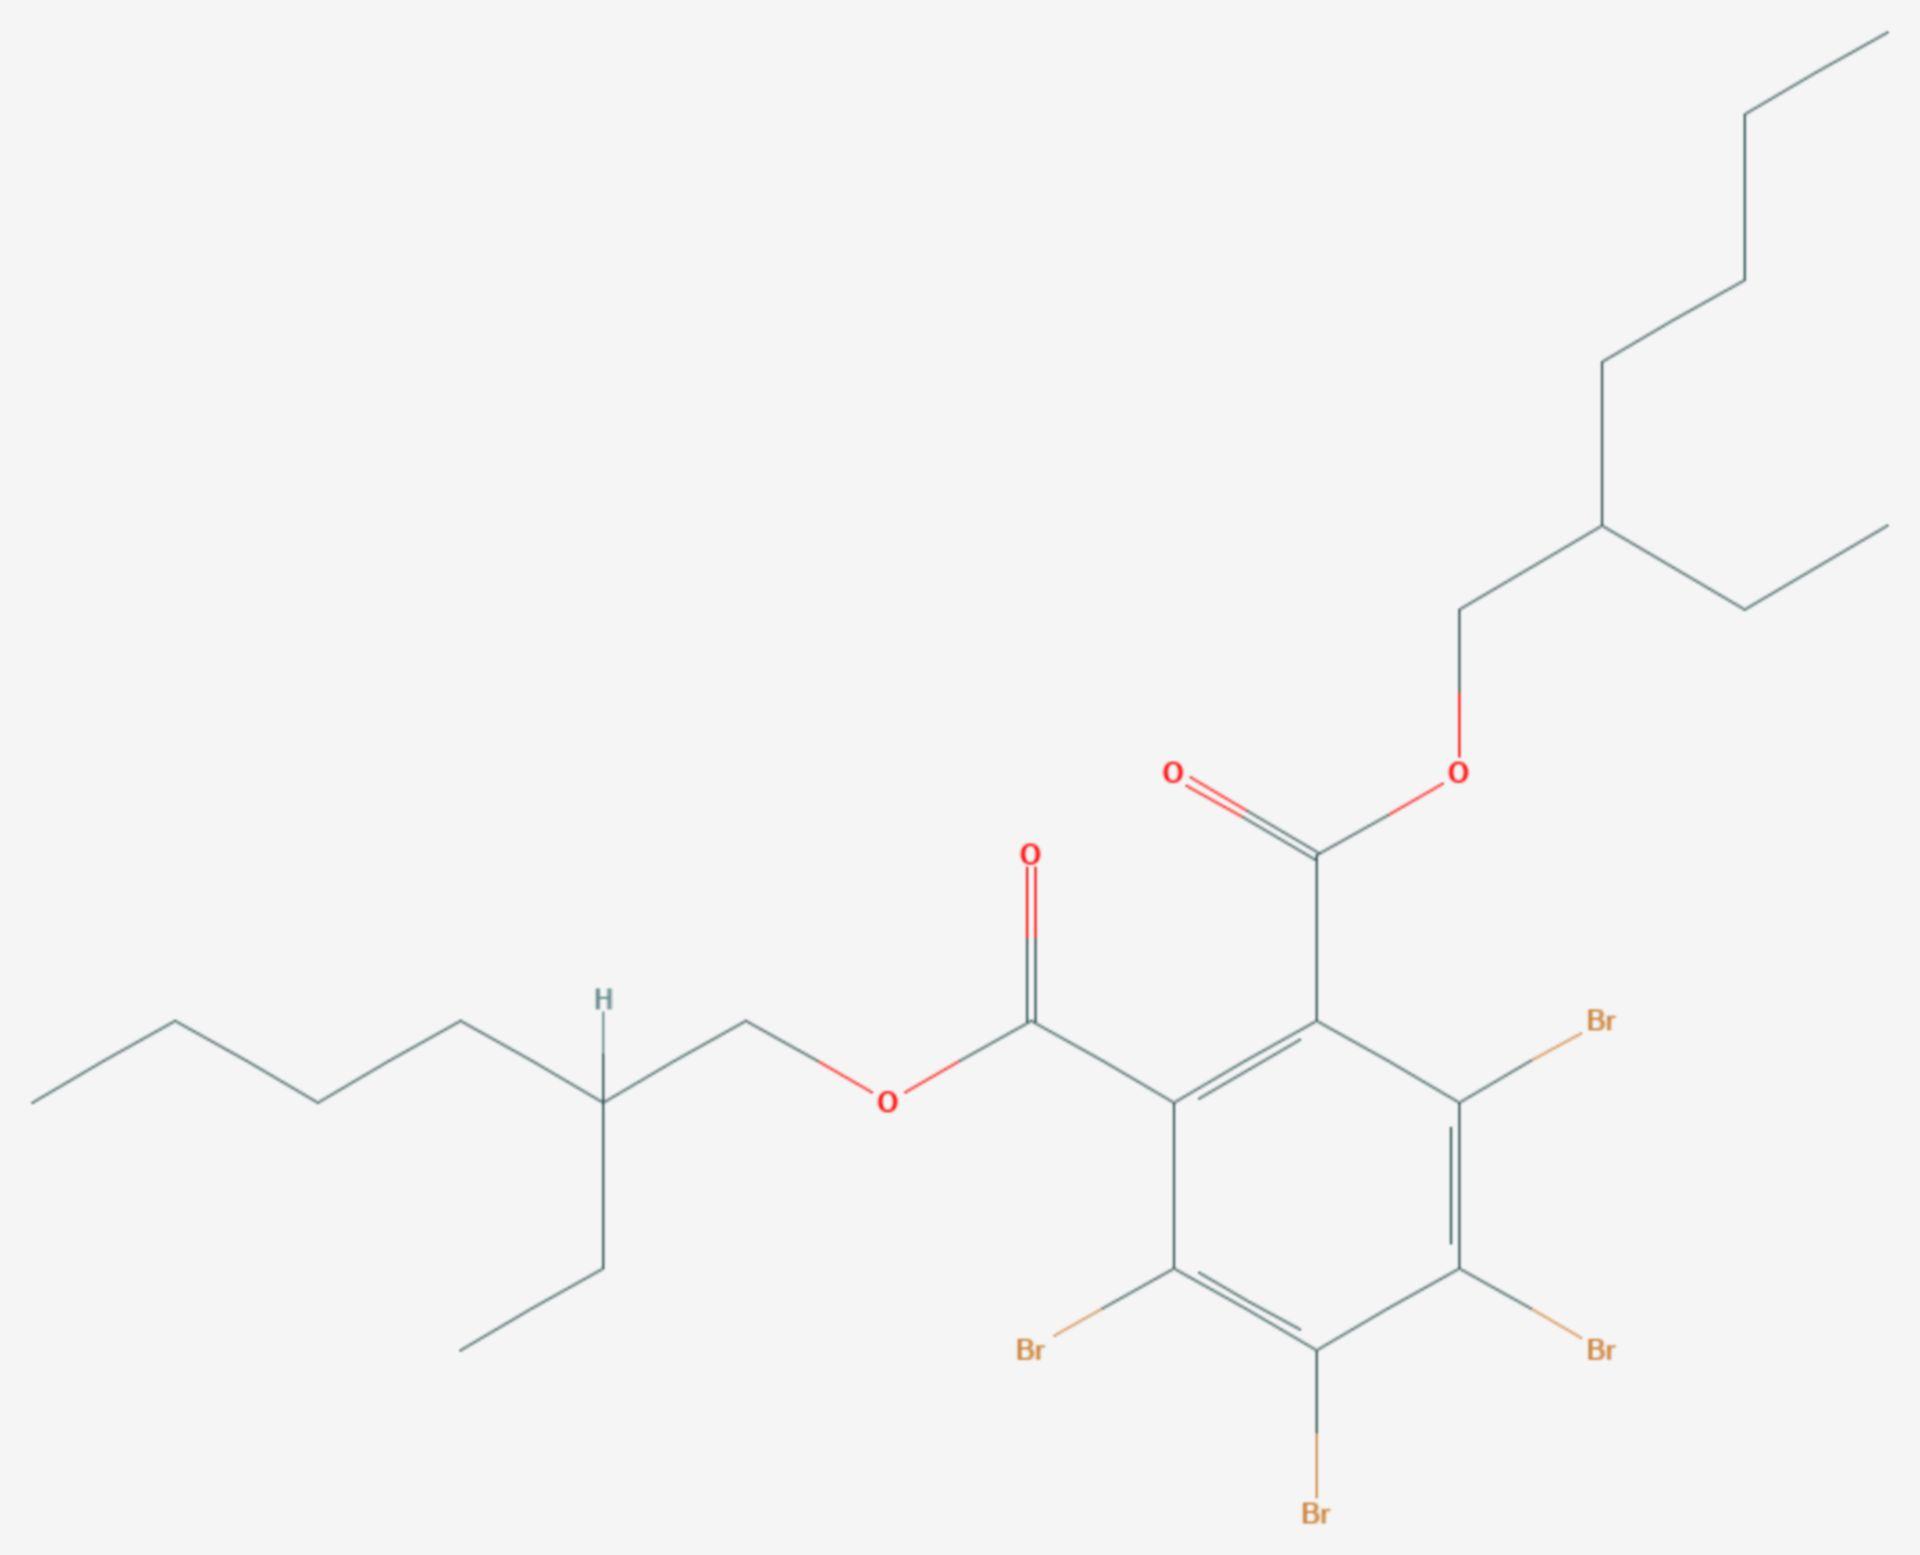 Bis(2-ethylhexyl)tetrabromphthalat (Strukturformel)